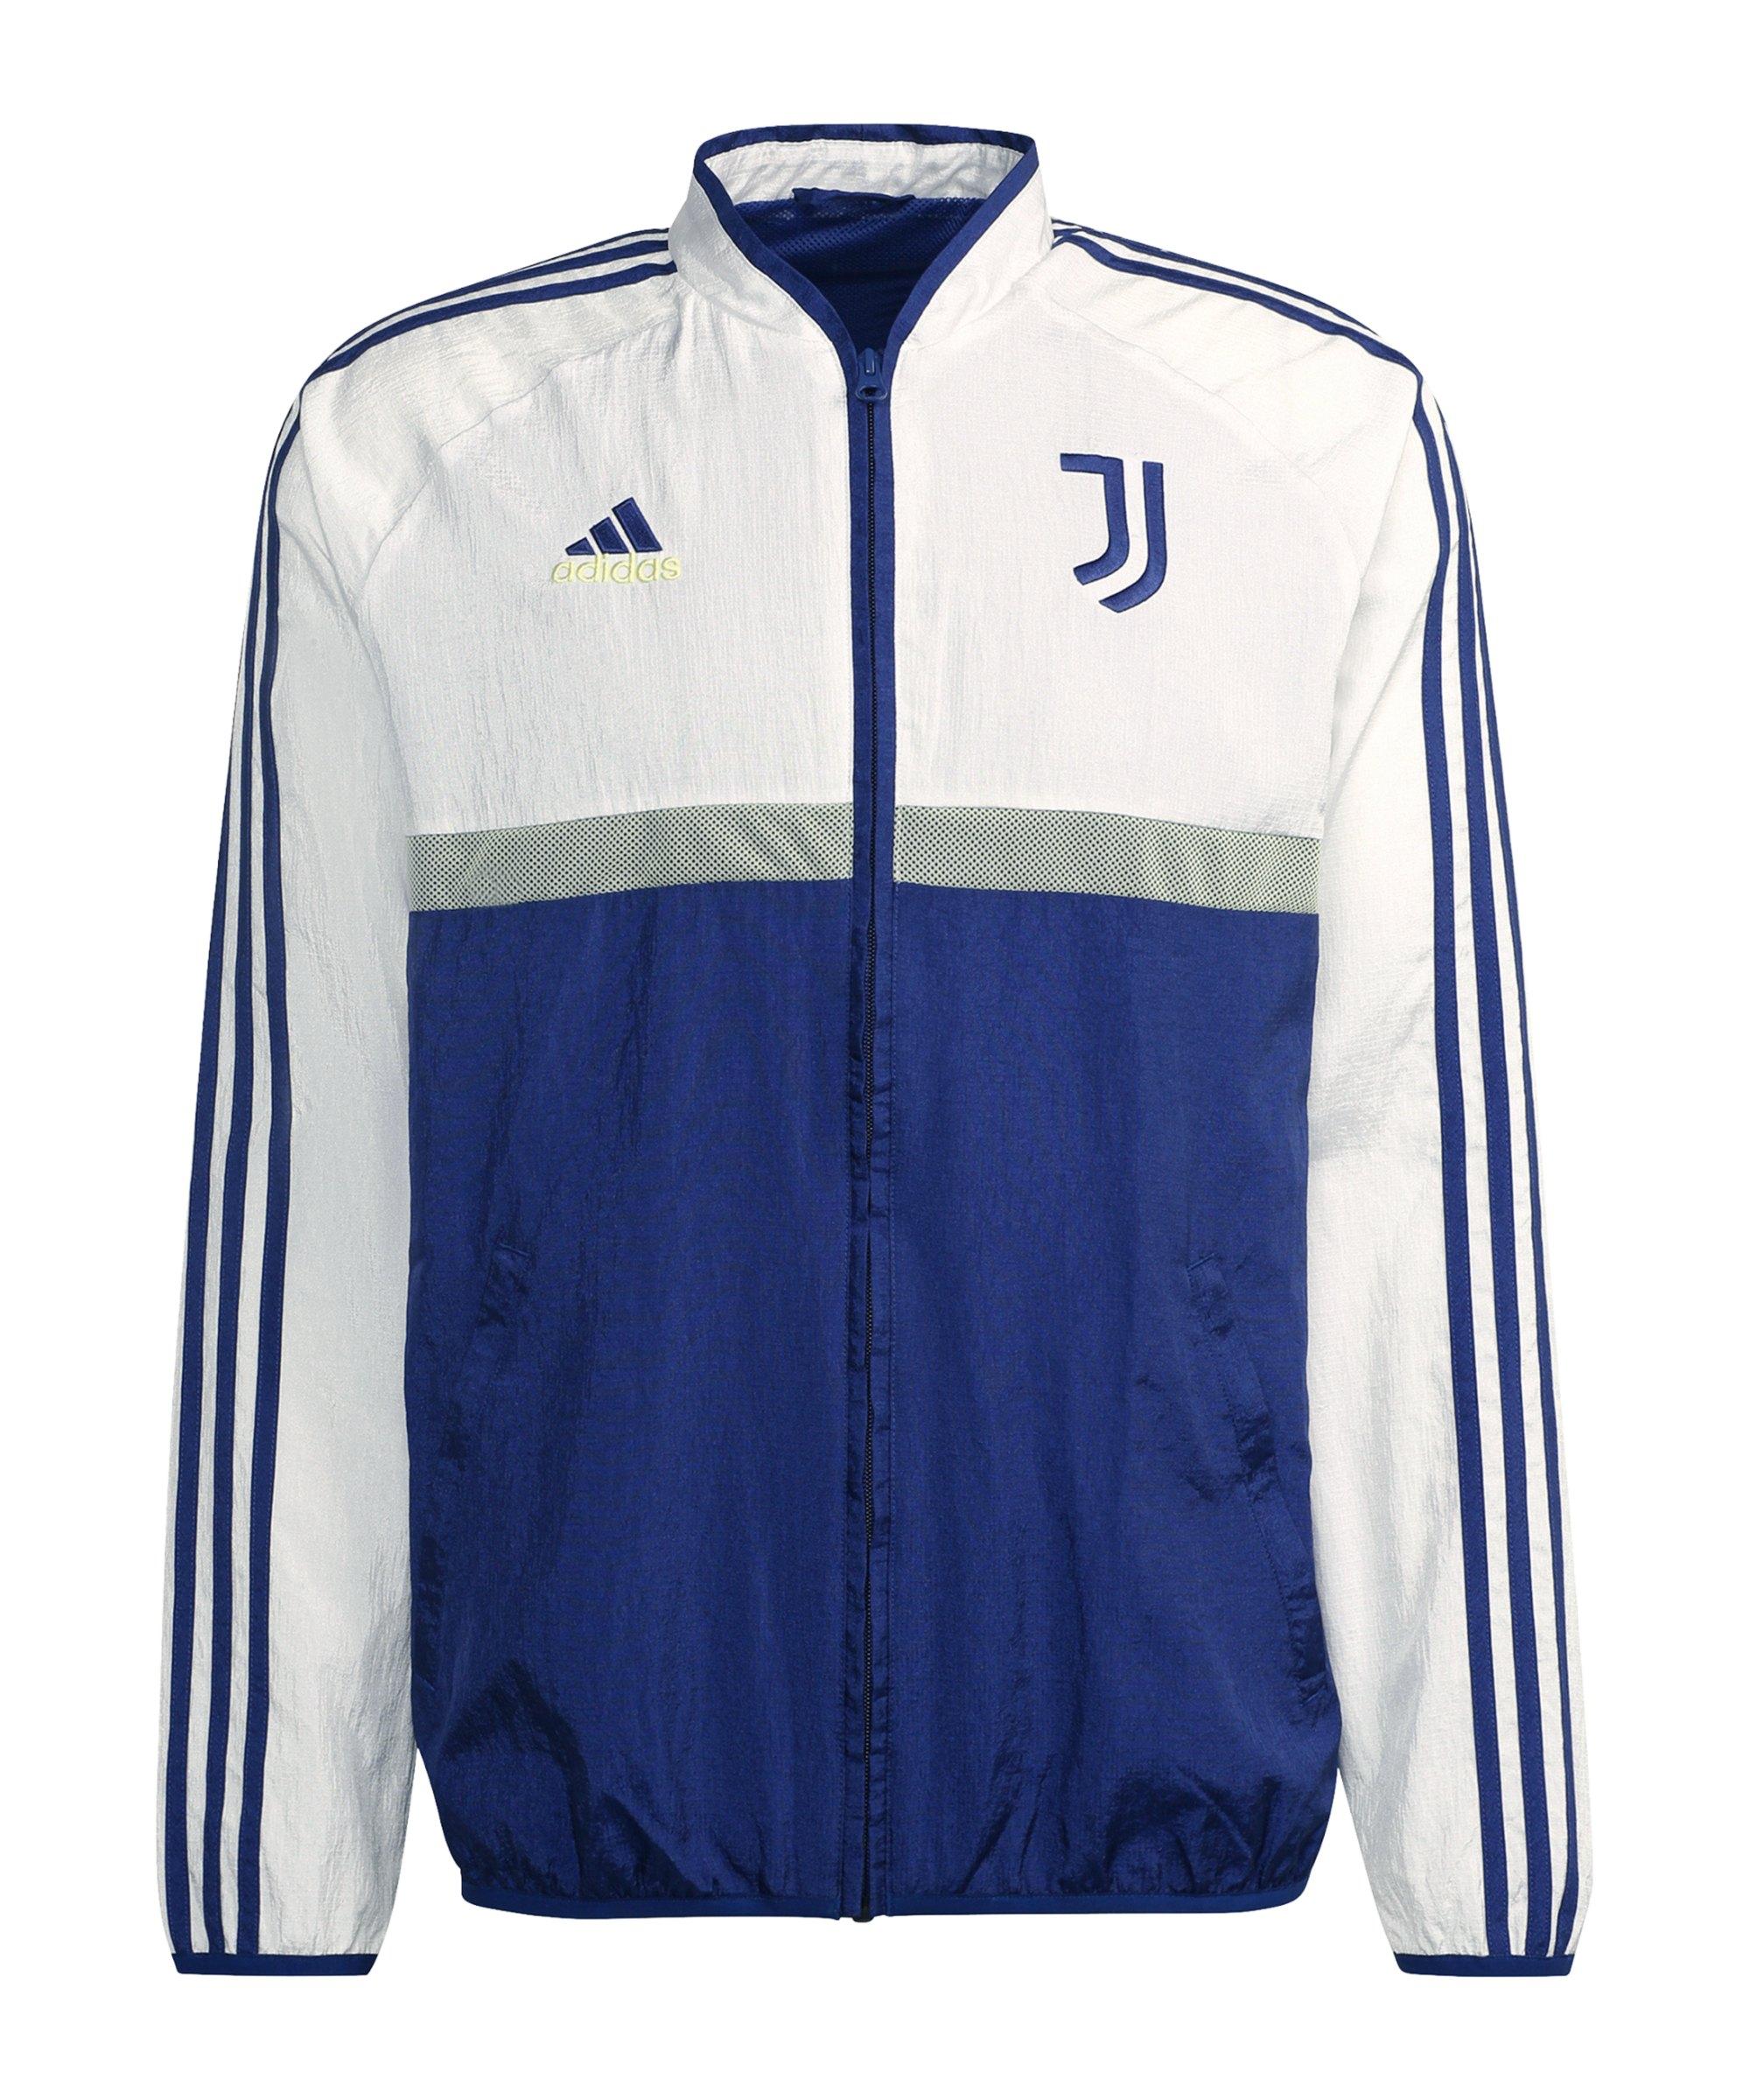 adidas Juventus Turin Icon Woven Jacke Blau Weiss - weiss